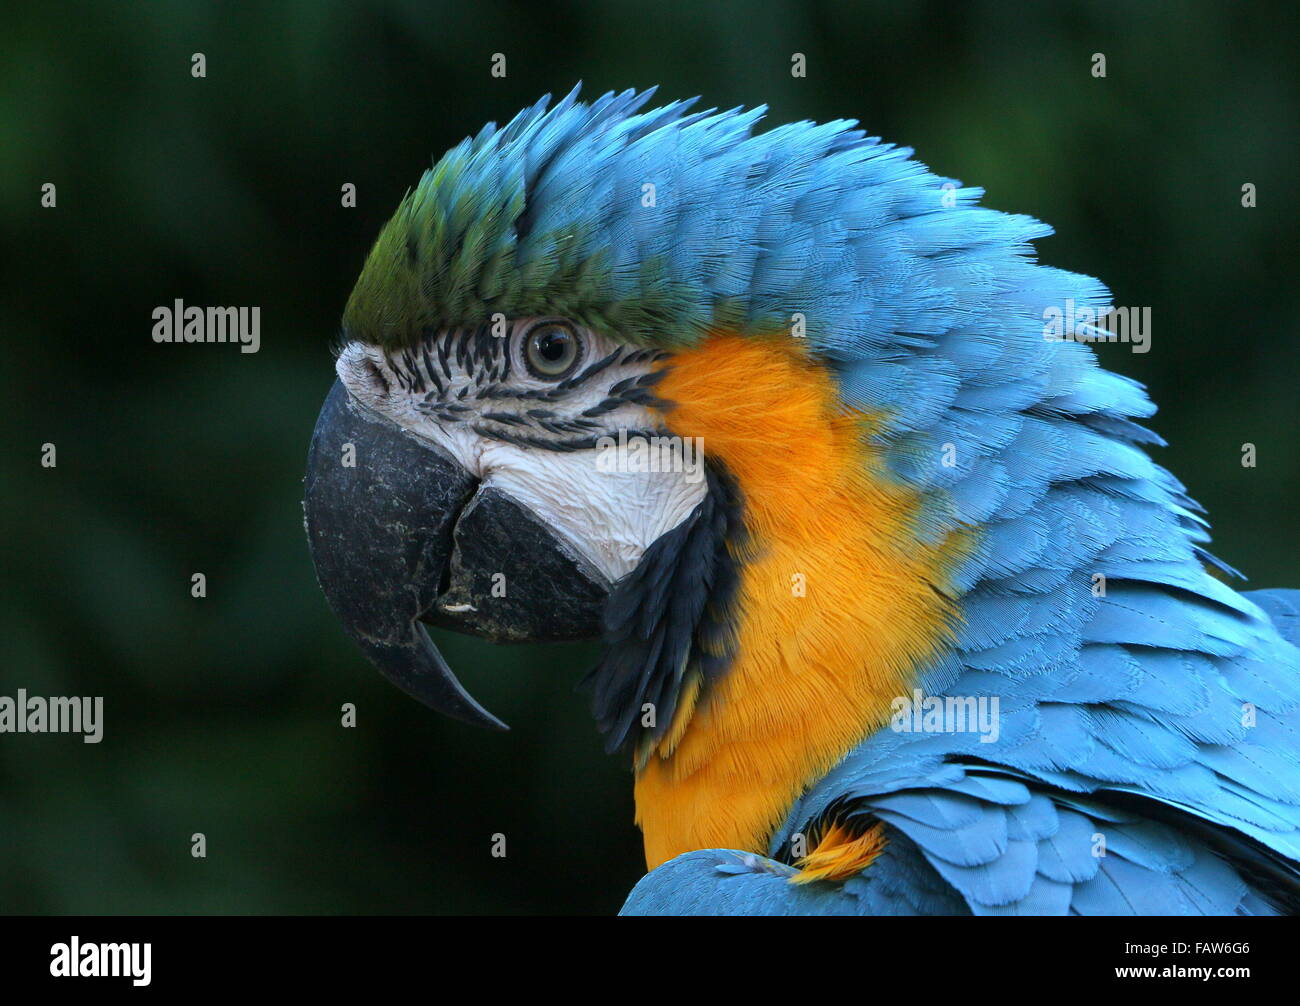 South American Blue and yellow macaw (Ara ararauna) portrait. - Stock Image